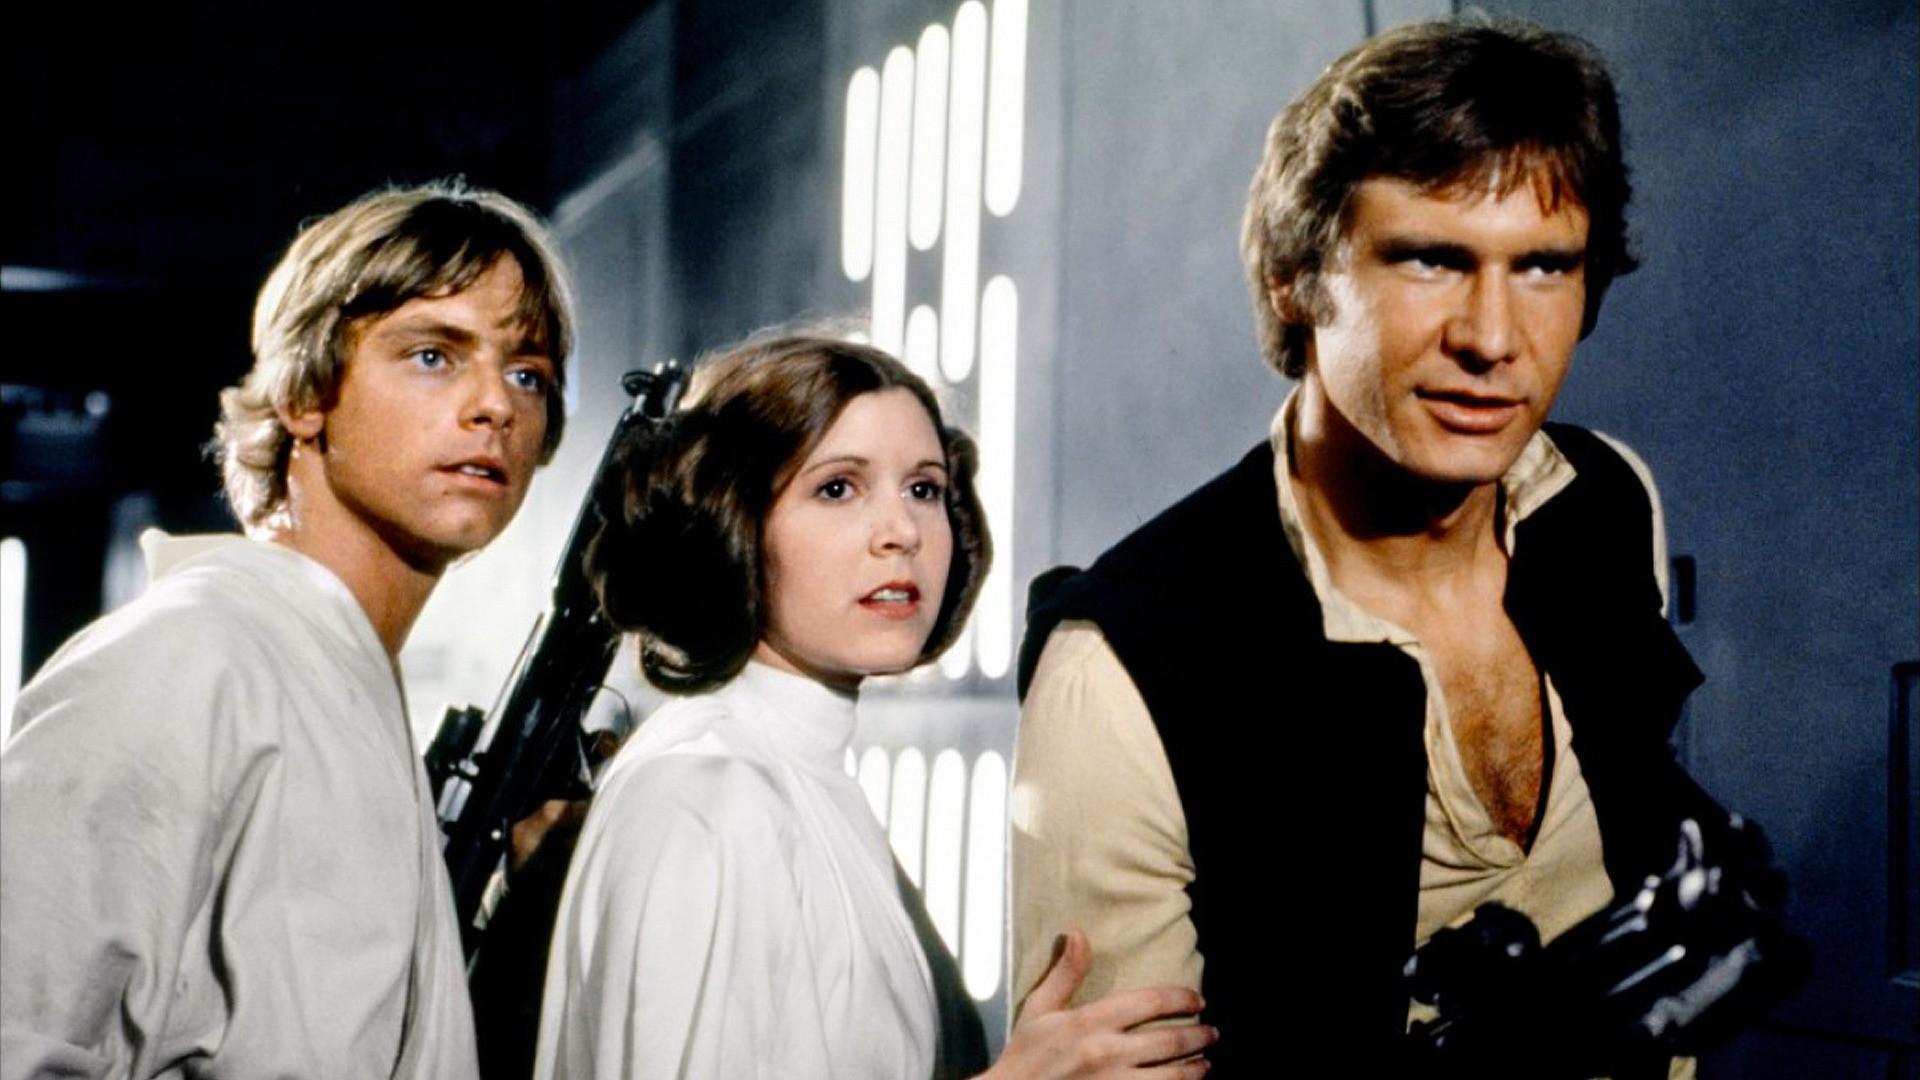 Star wars episode iv – a new hope 1977